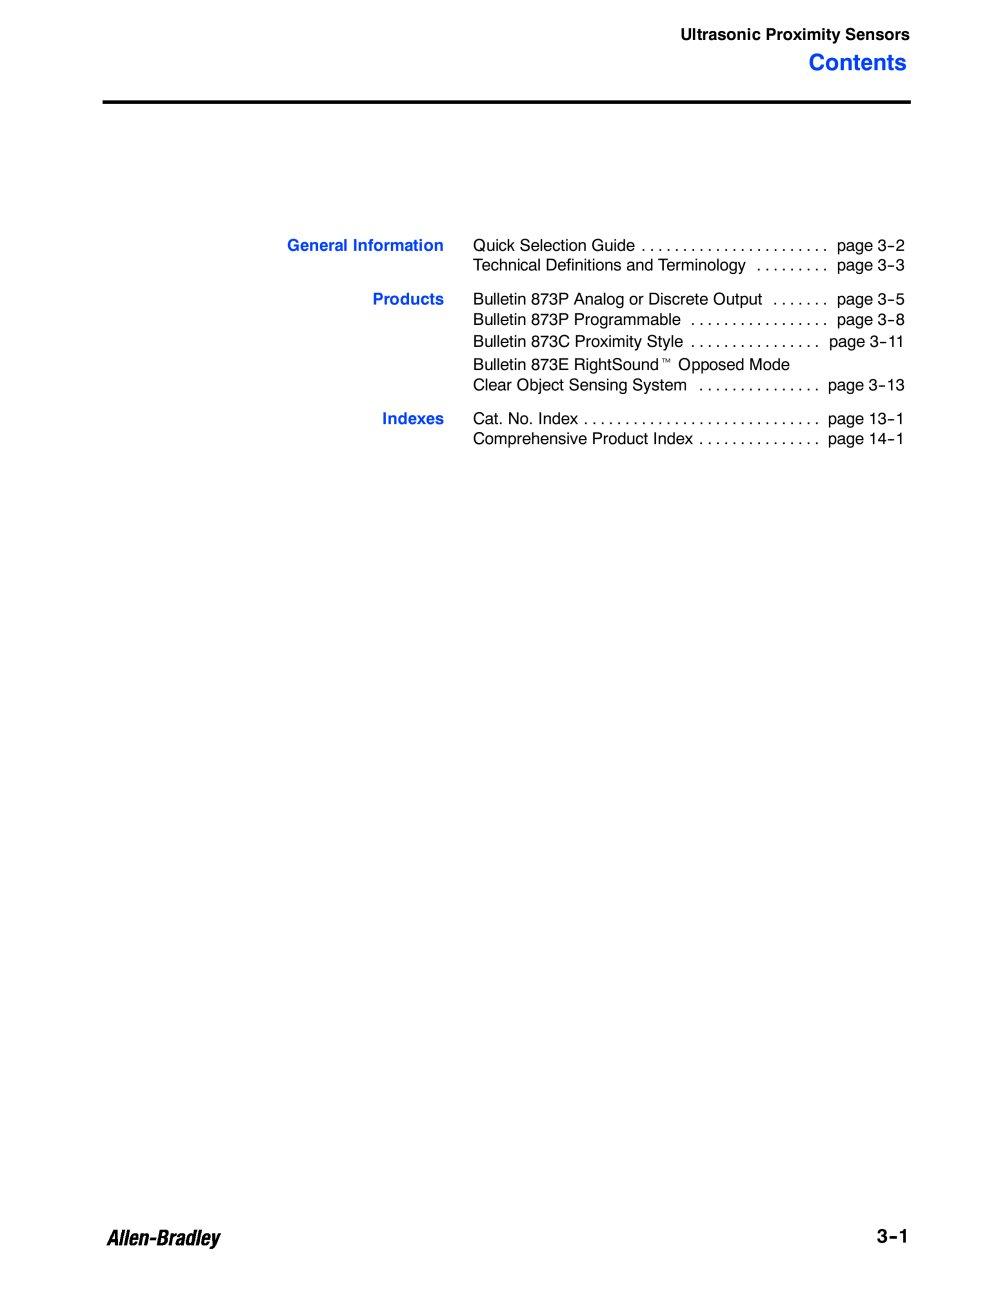 Ultrasonic Sensors - Allen Bradley - PDF Catalogue | Technical ...